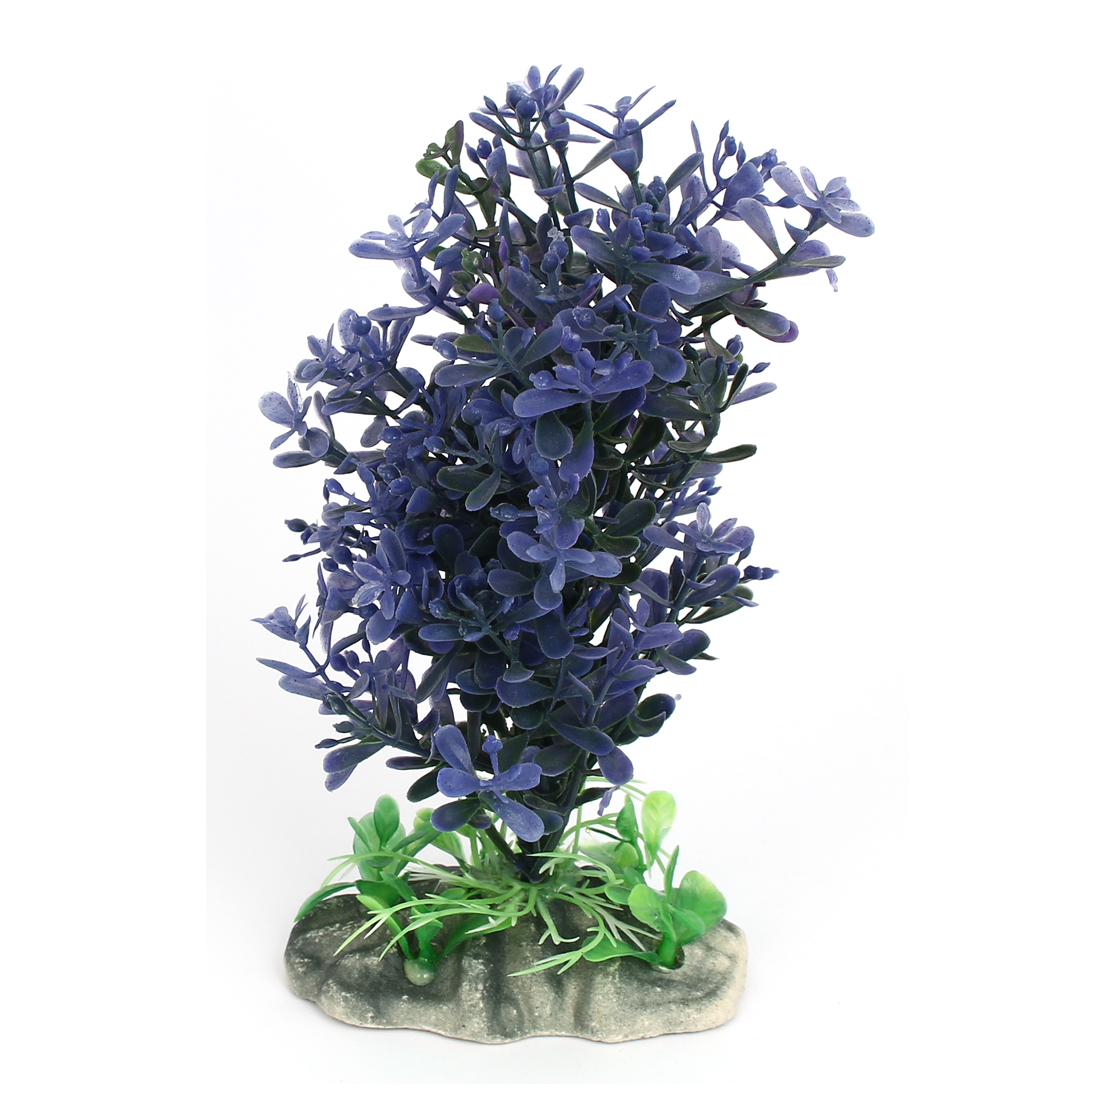 Aquarium Fish Tank Simulated Artificial Water Plant Grass Decor Ornament Purple